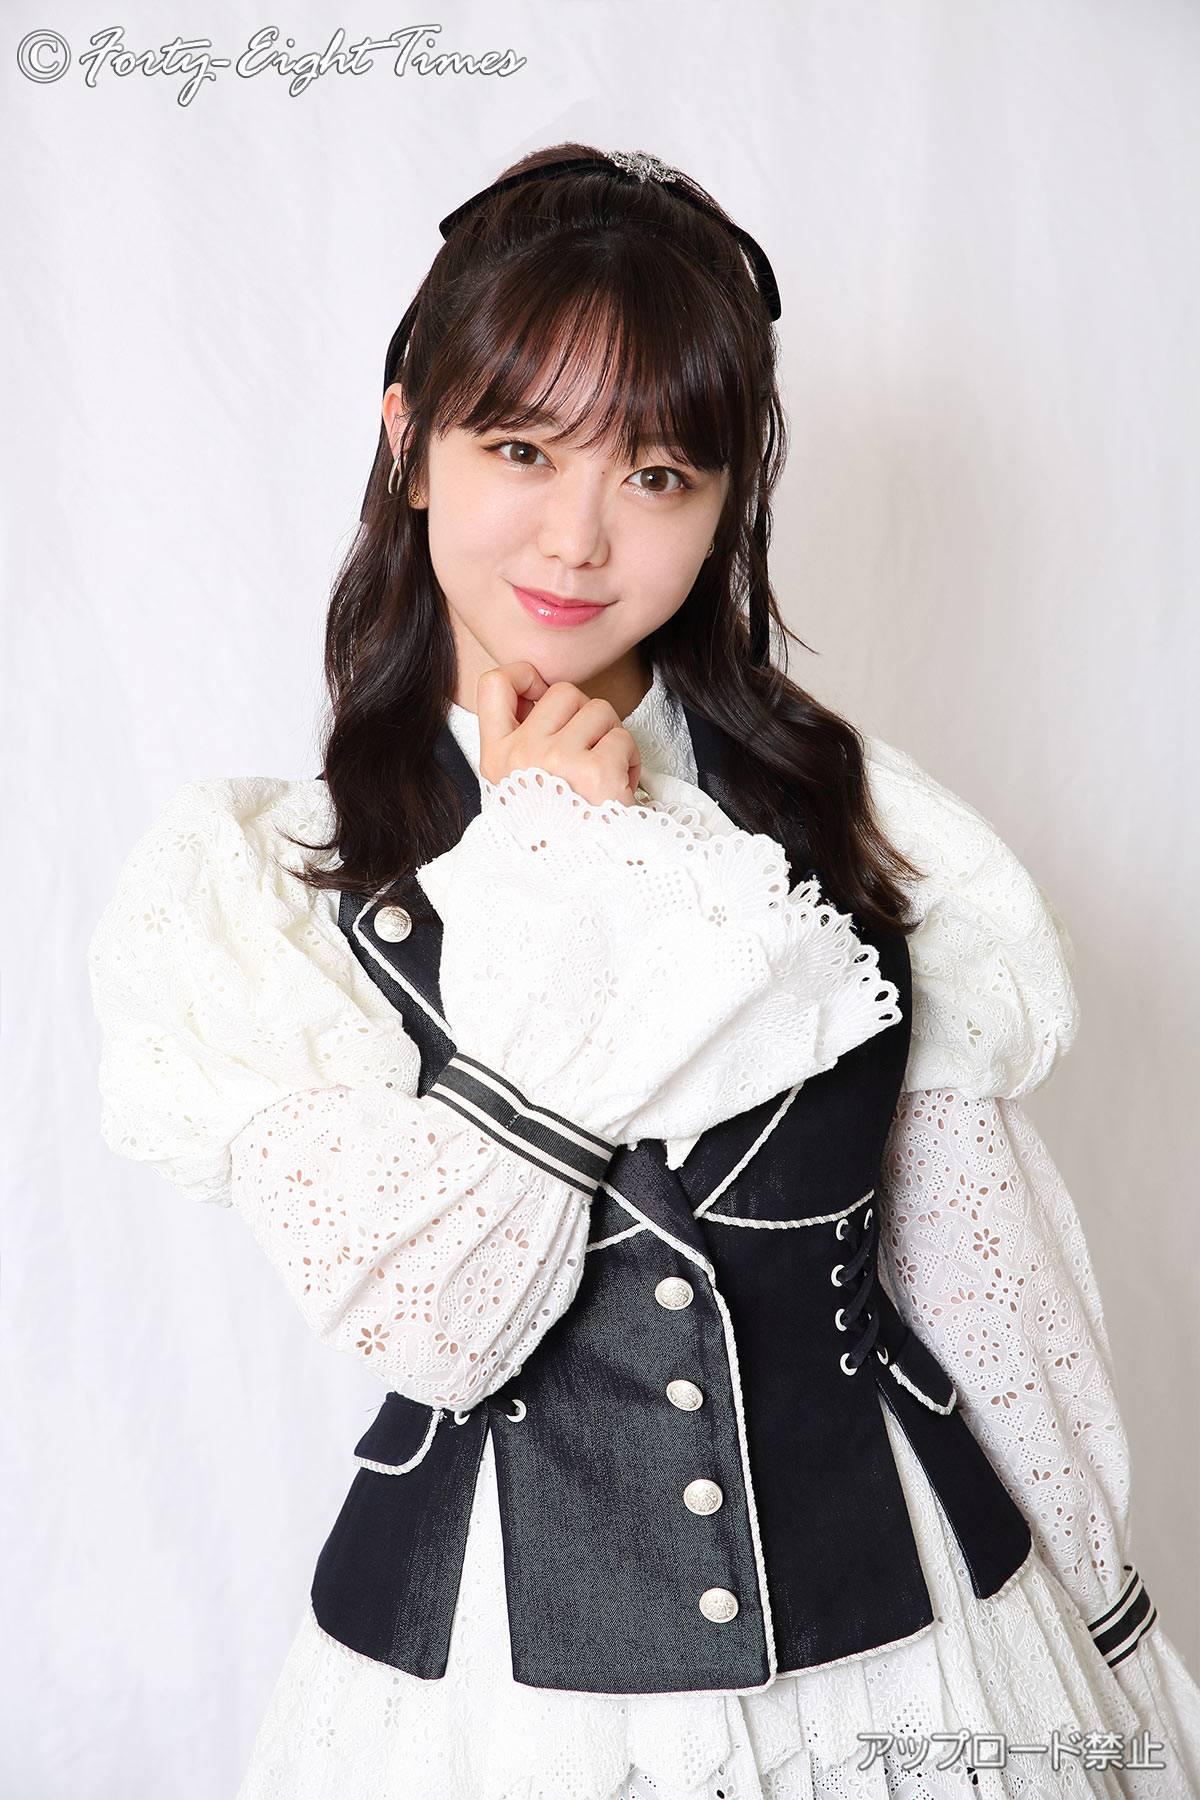 Minegishi Minami 48 Times 2105 04.jpg